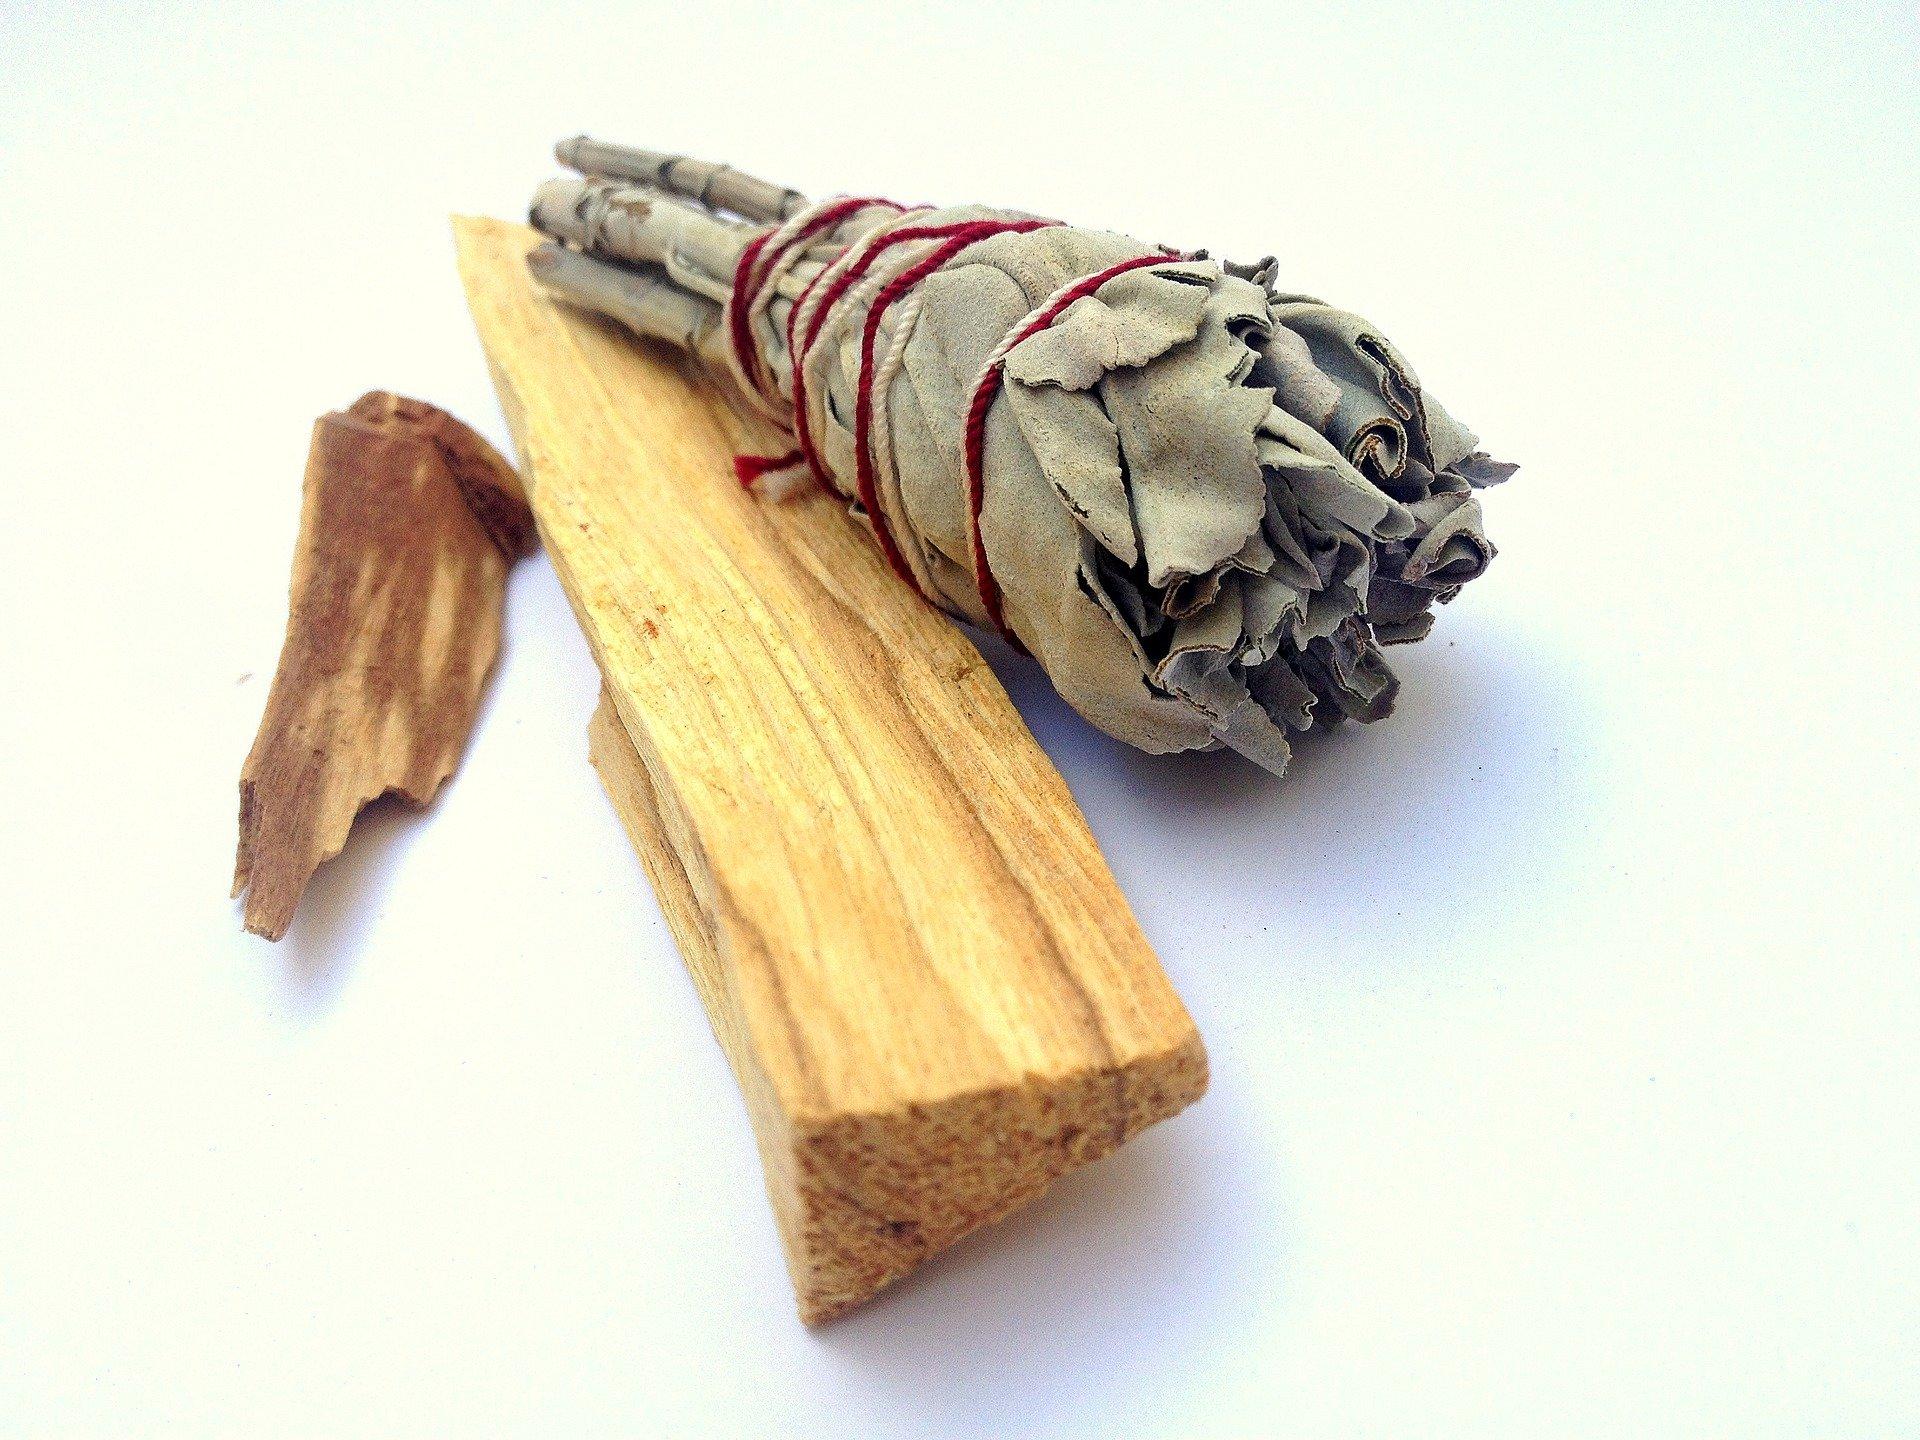 palo santo wood shavings and dried leaves